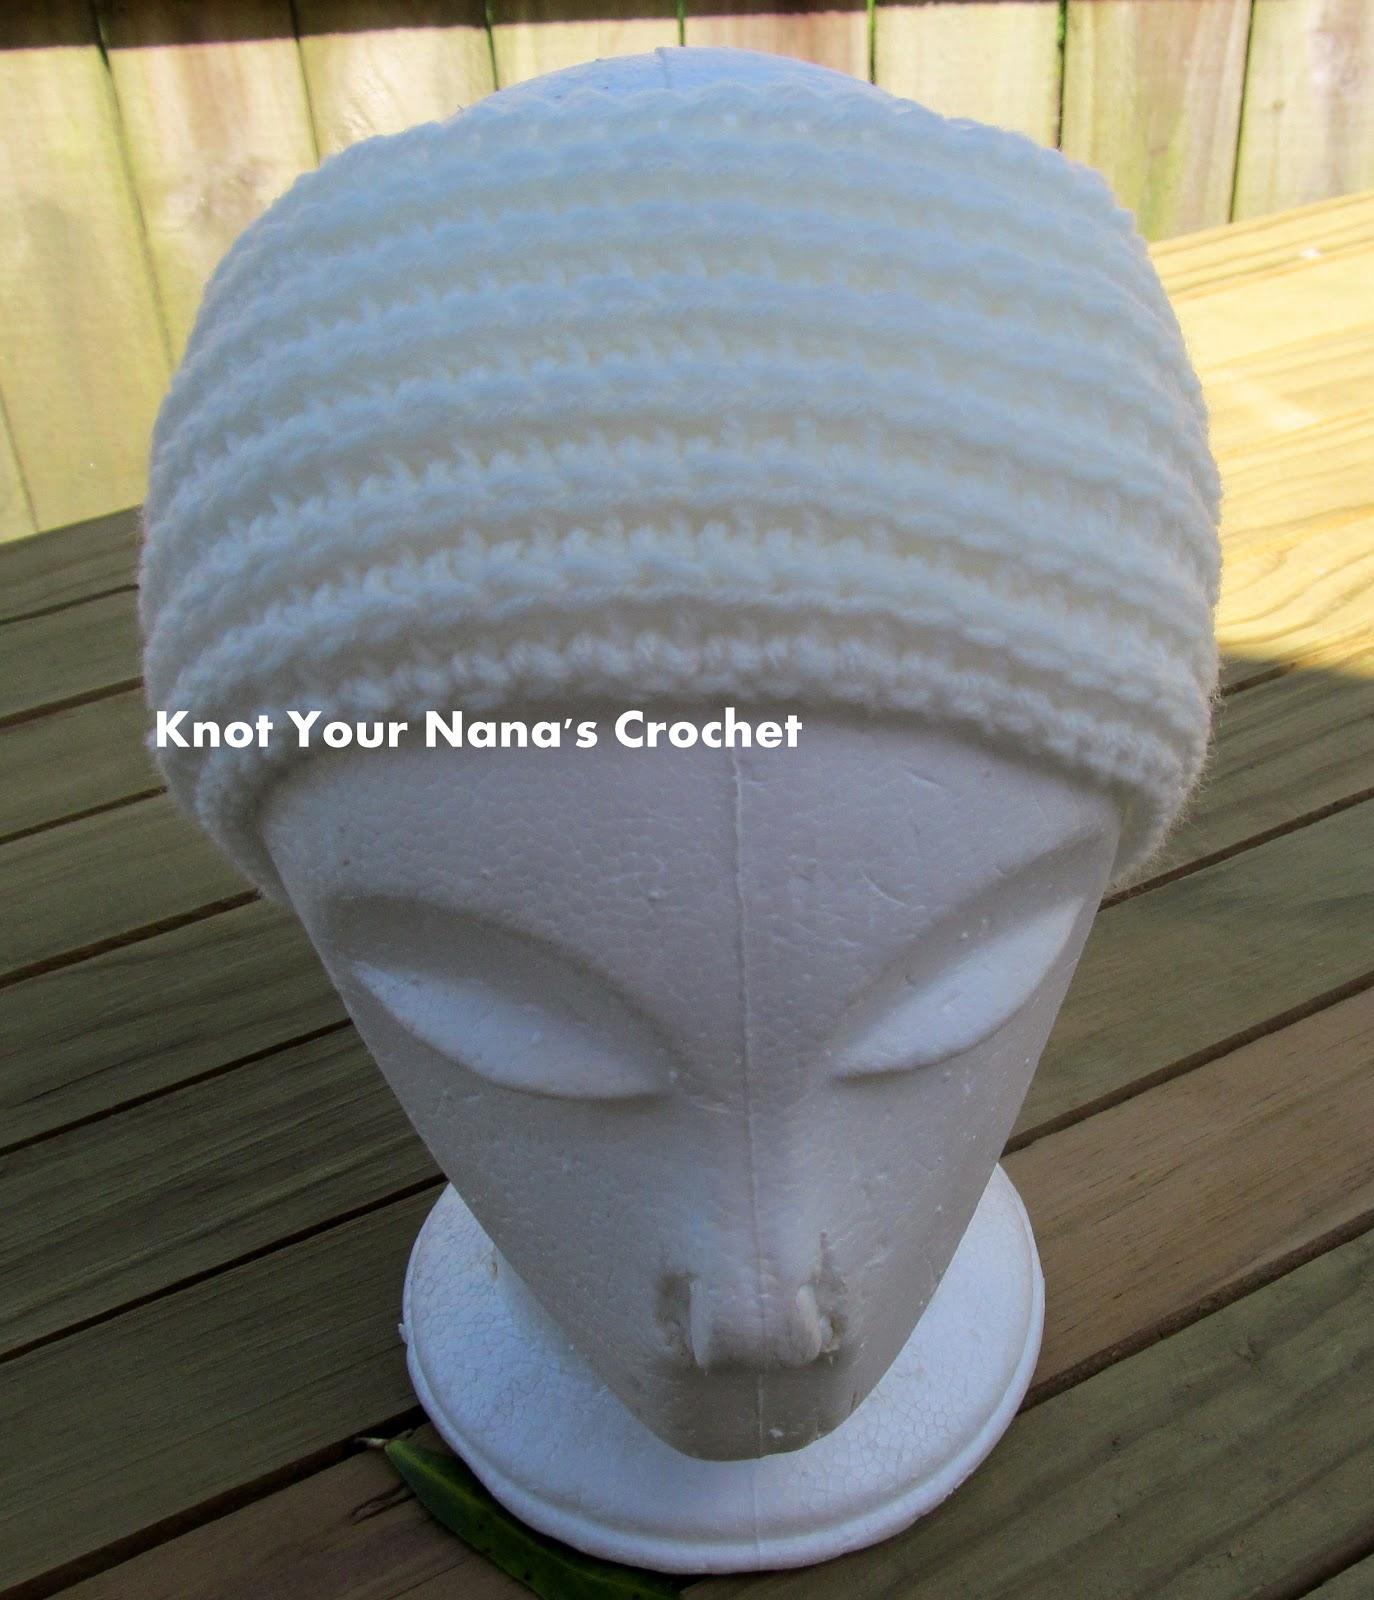 Knot Your Nanas Crochet: Camel Stitch Ear Warmer (knit look)